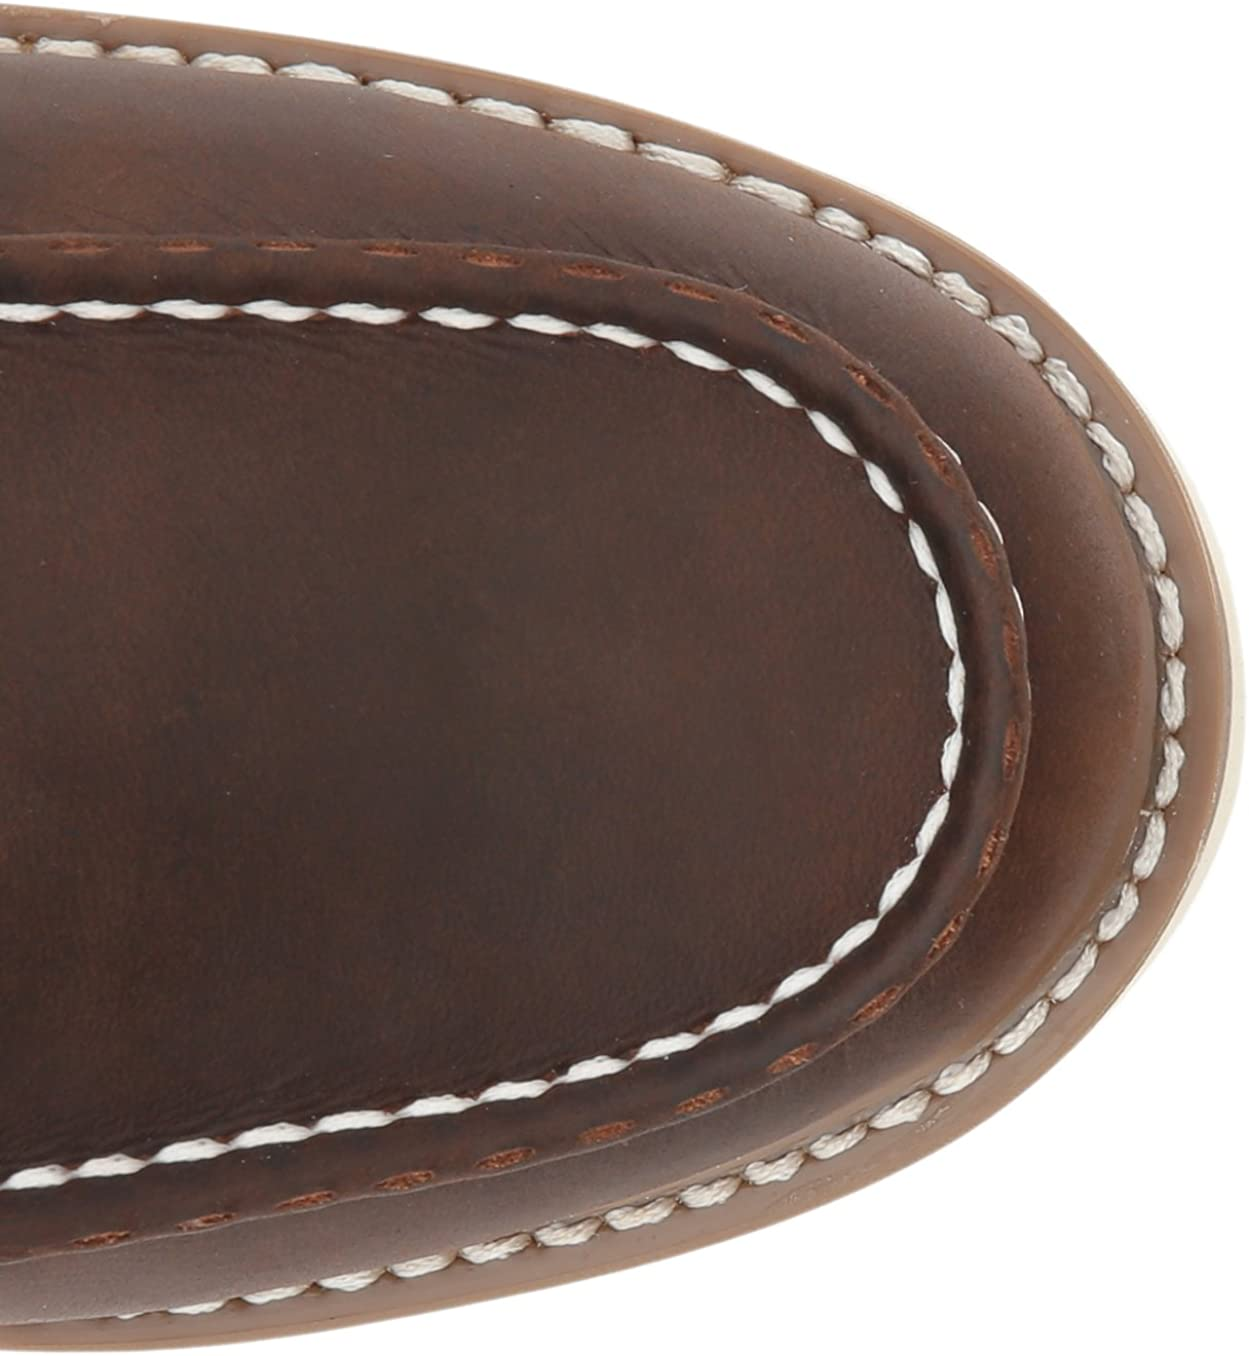 WOLVERINE Mens Loader 8 Soft Toe Wedge Work Boot